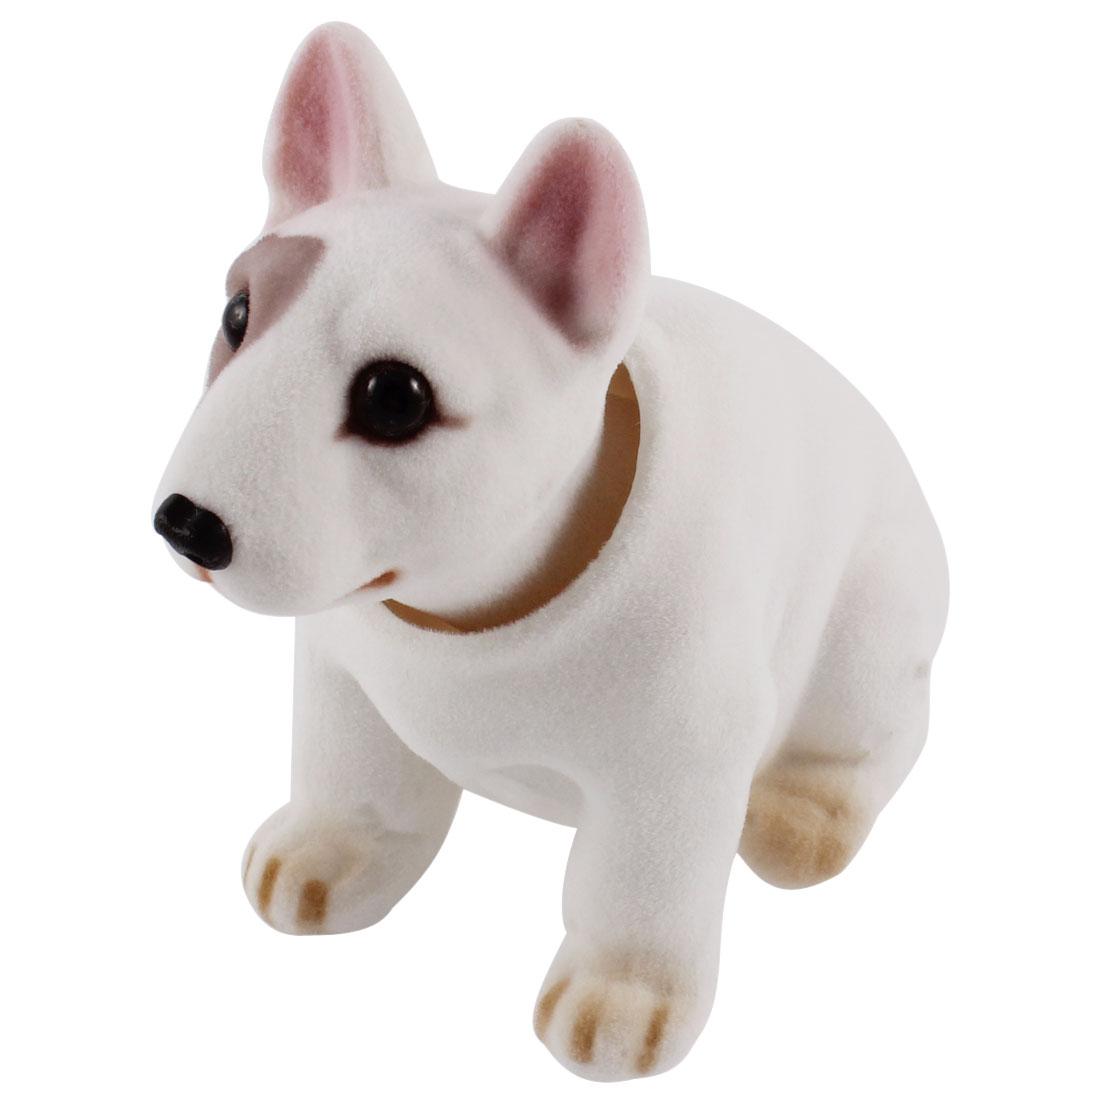 Car Dog Shape Nod Nodding Bobblehead Dashboard Ornament White